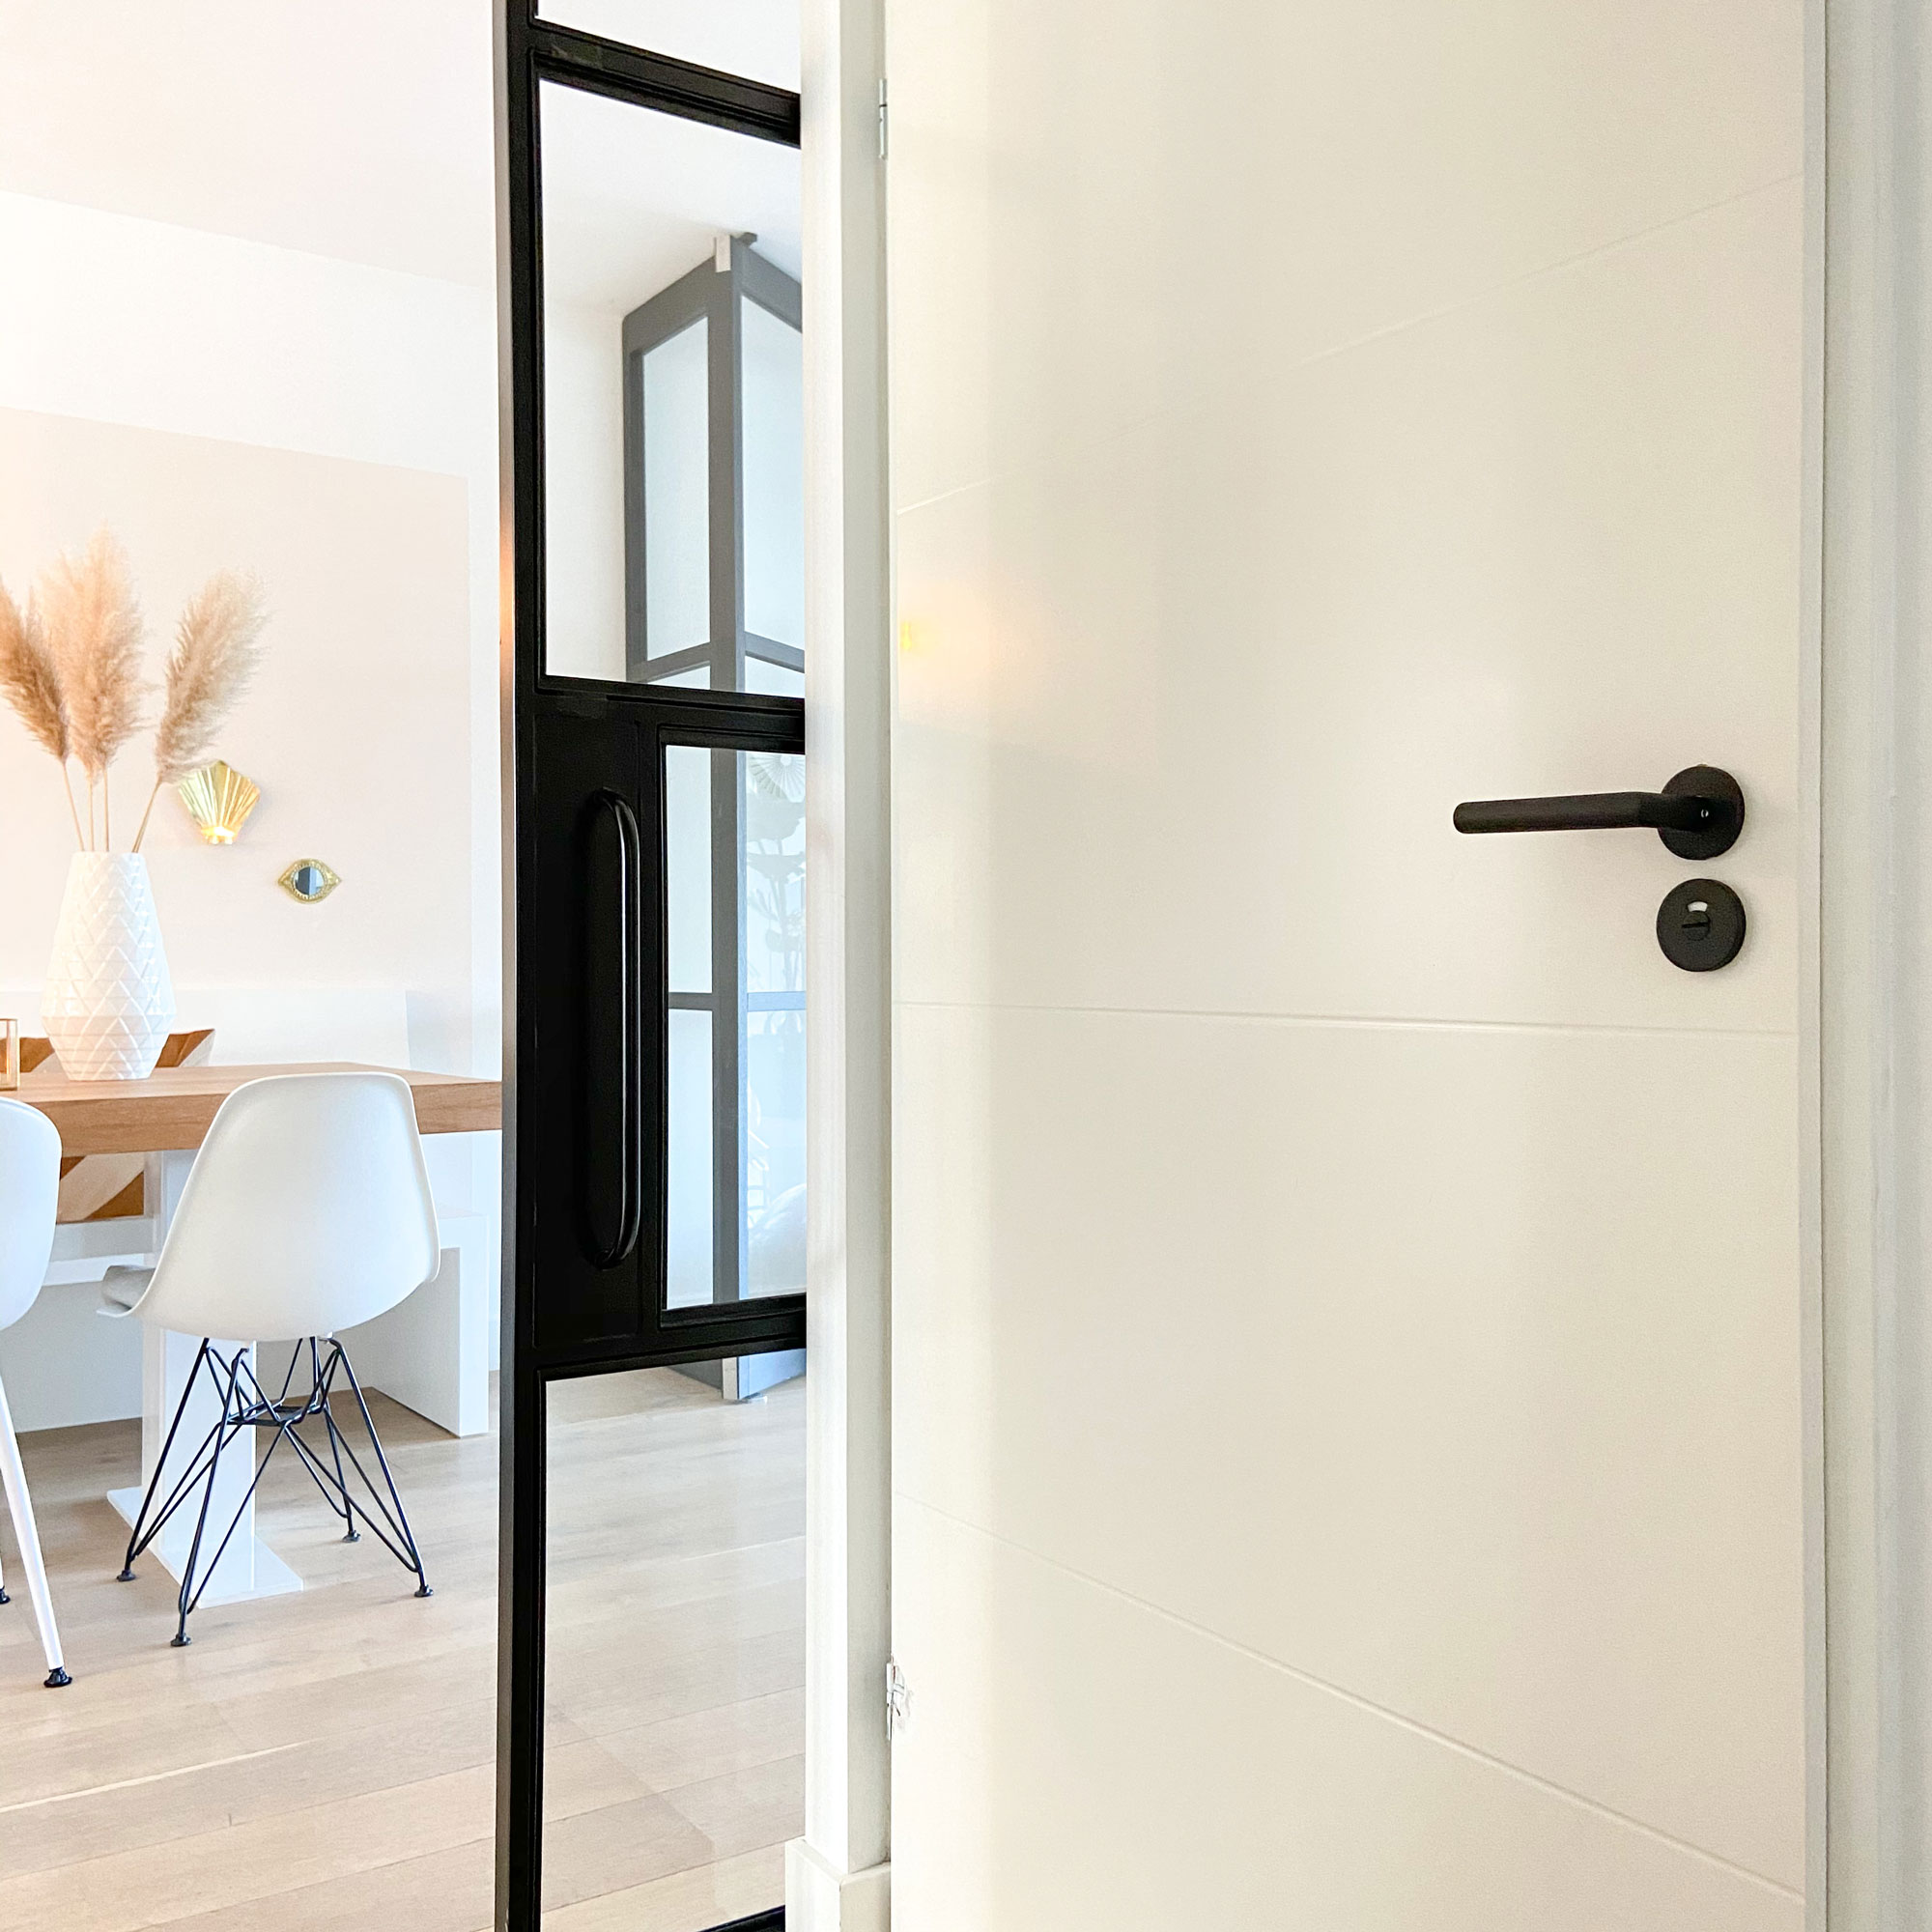 Sfeerimpressie GPF810VZ deurkruk op rozet GPF8903VZ toiletgarnituur.jpg